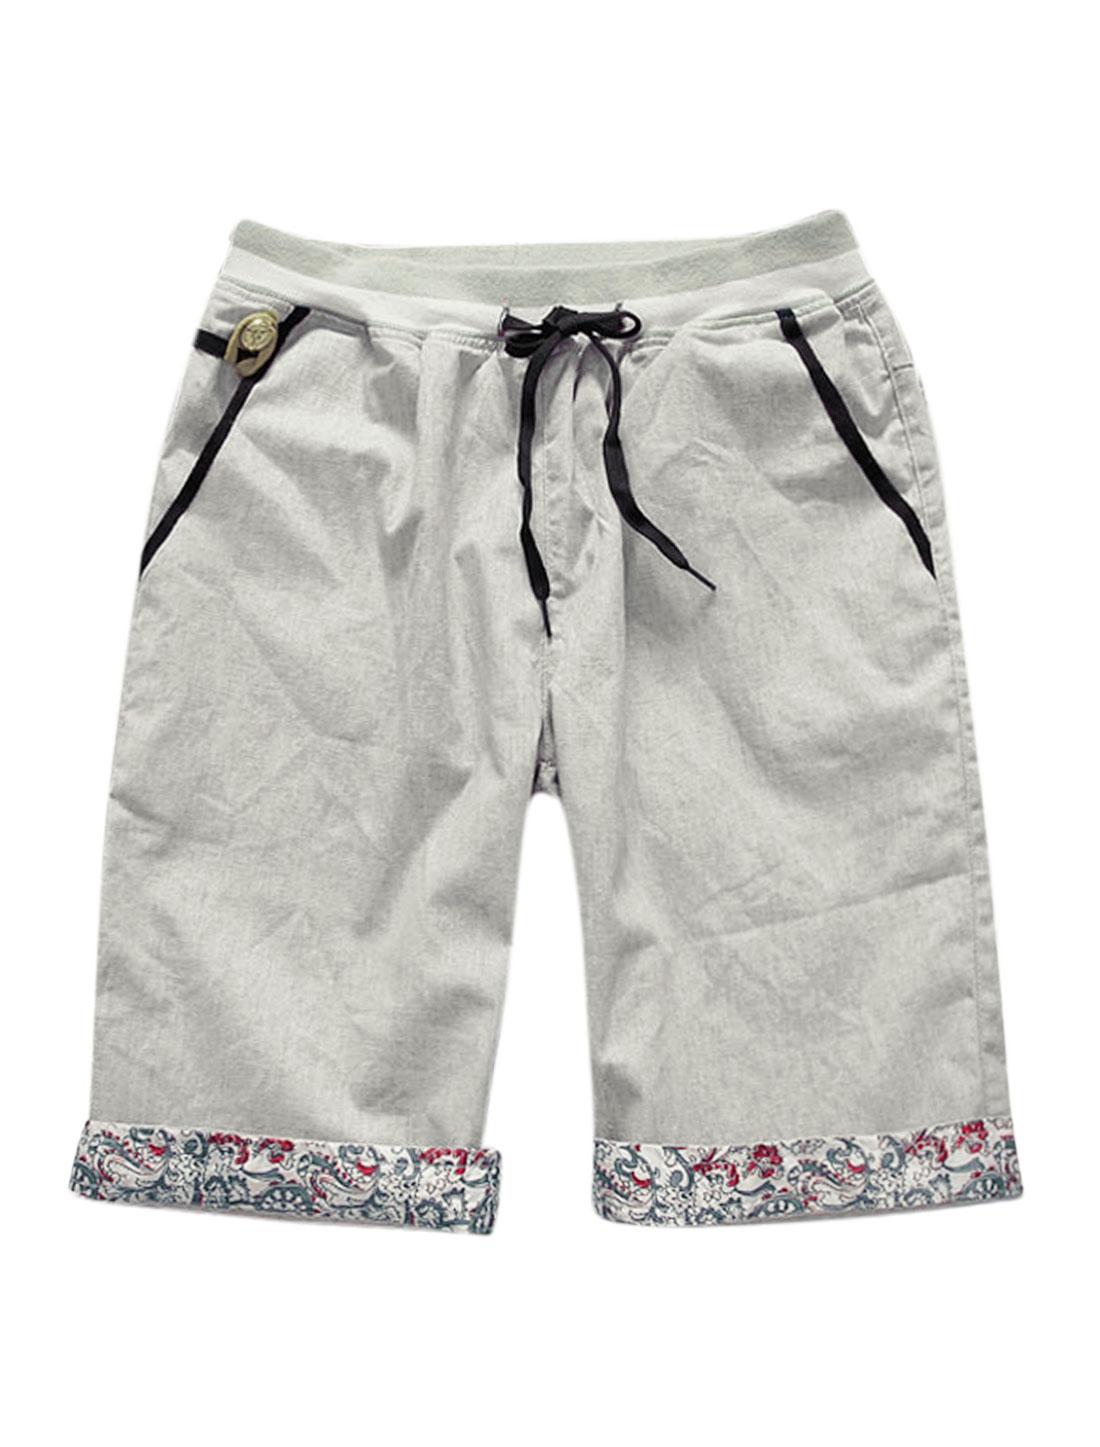 Man Ribbed Elastic Waist Slant Pockets Front Leisure Shorts Light Gray W34